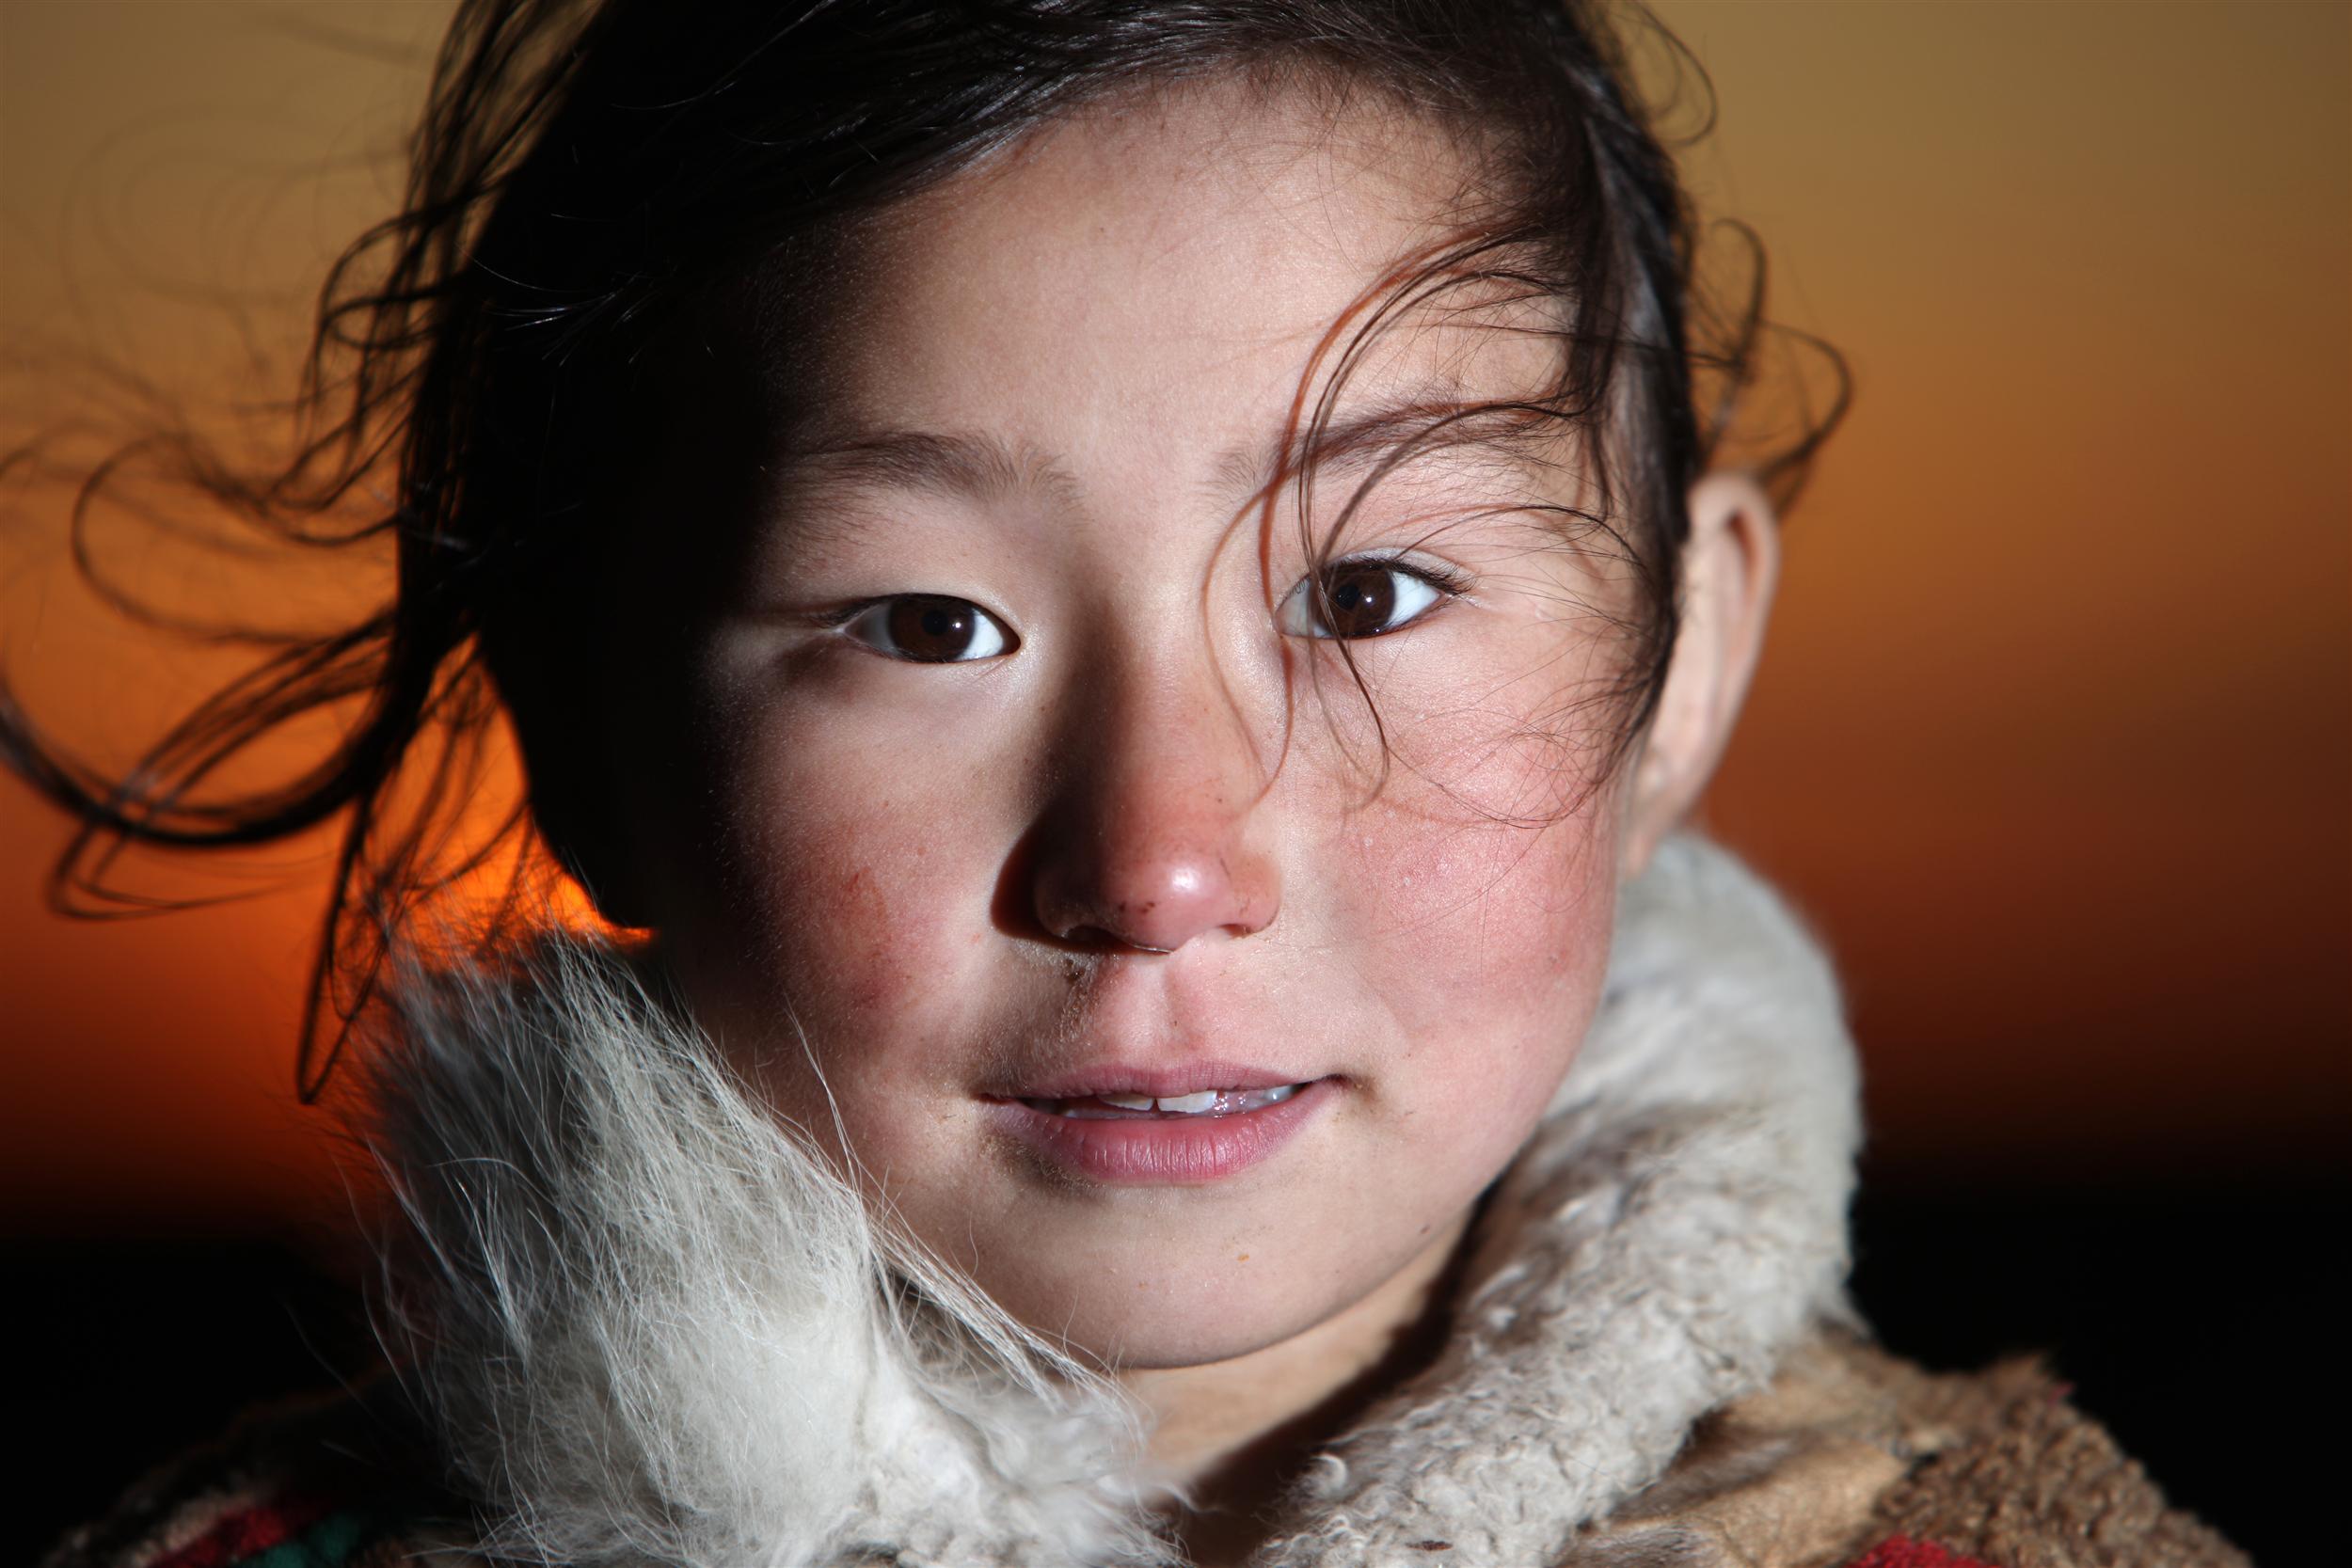 Indigenous girl